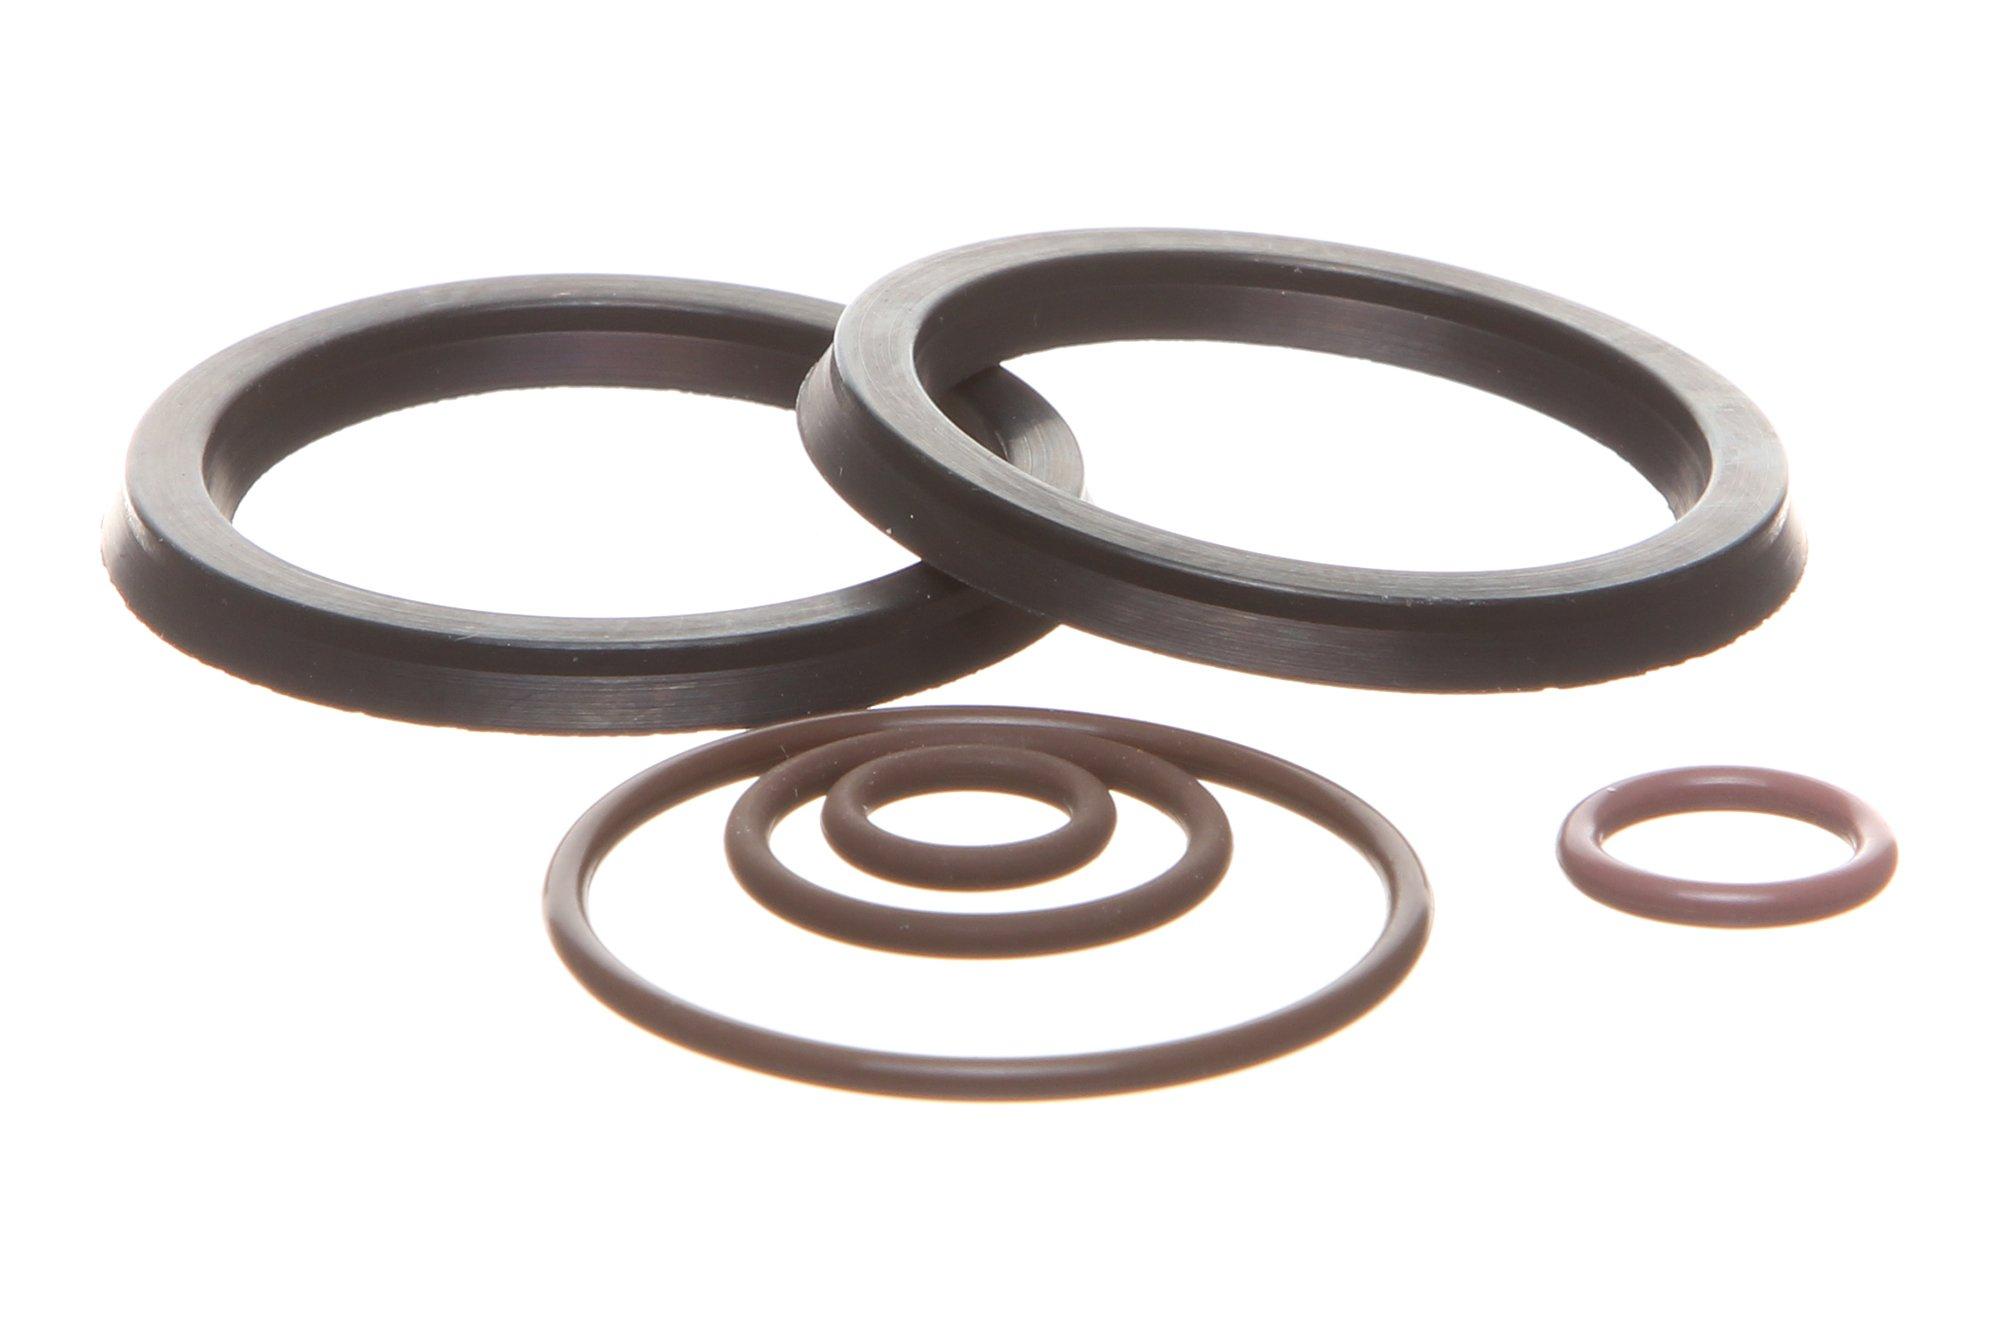 Duramax 66l Fuel Filter Primer Rebuild Seal Kit With Viton O Rings Location